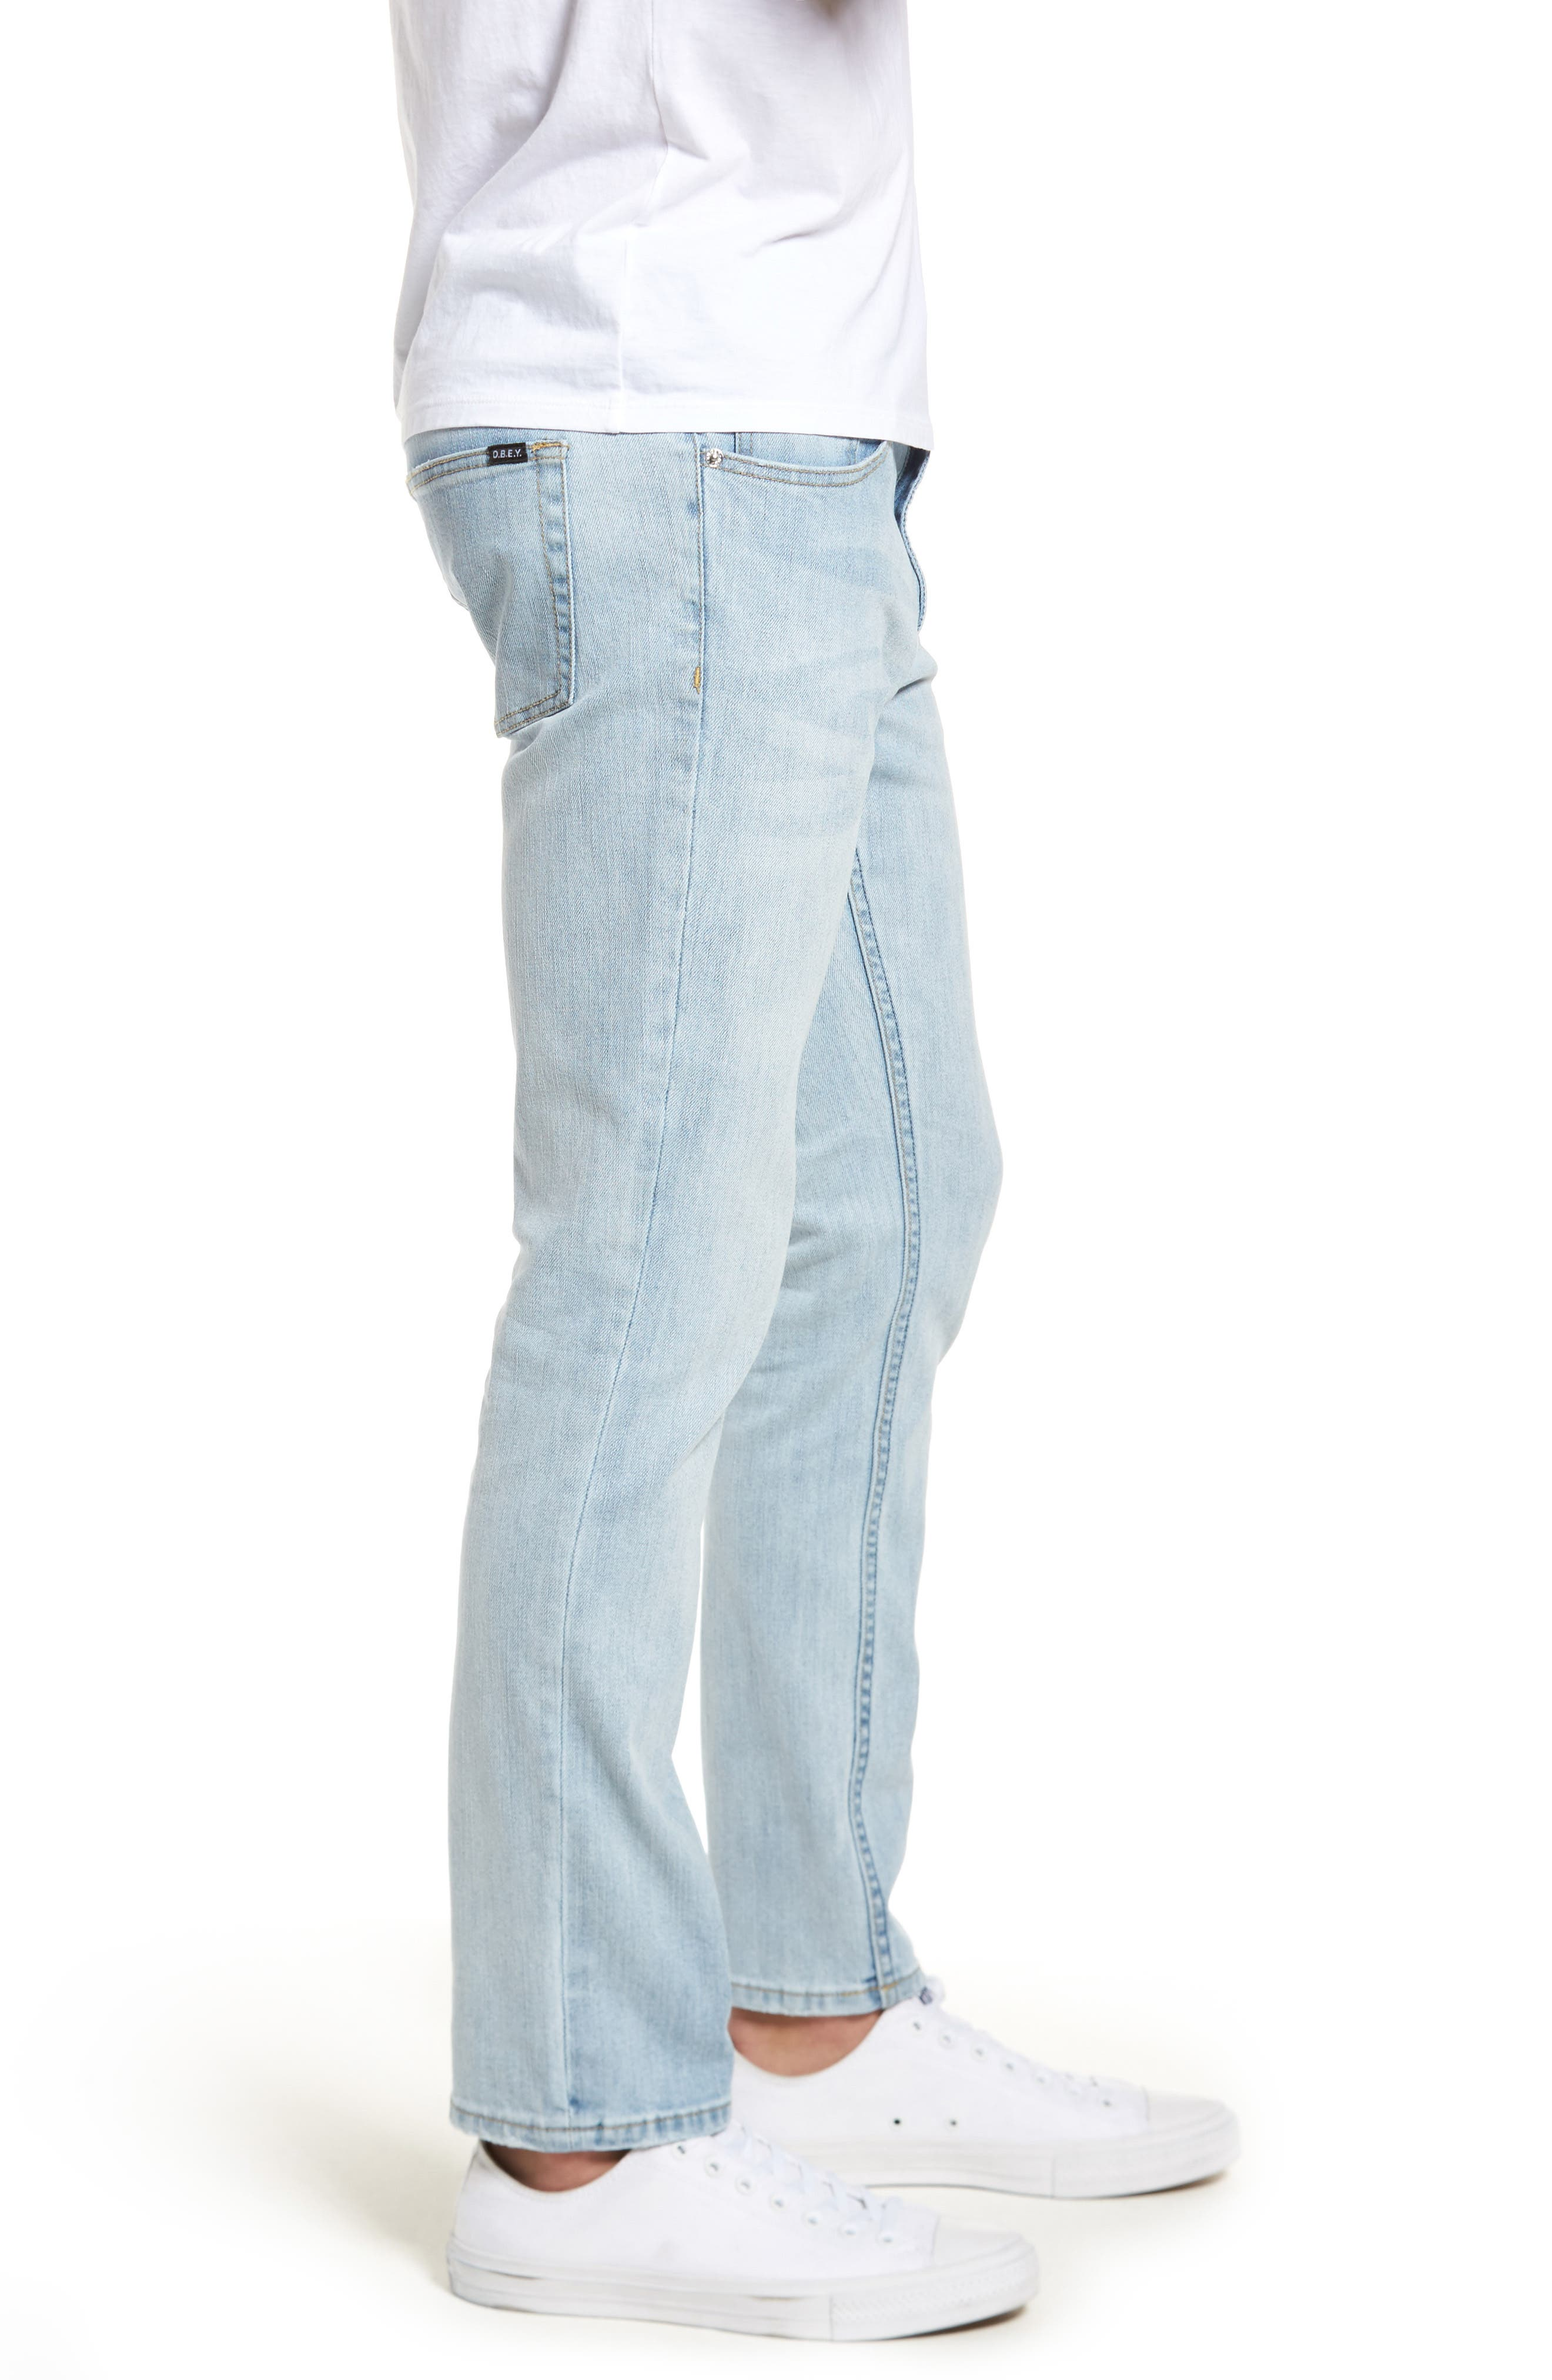 Juvee II Skinny Fit Jeans,                             Alternate thumbnail 3, color,                             400